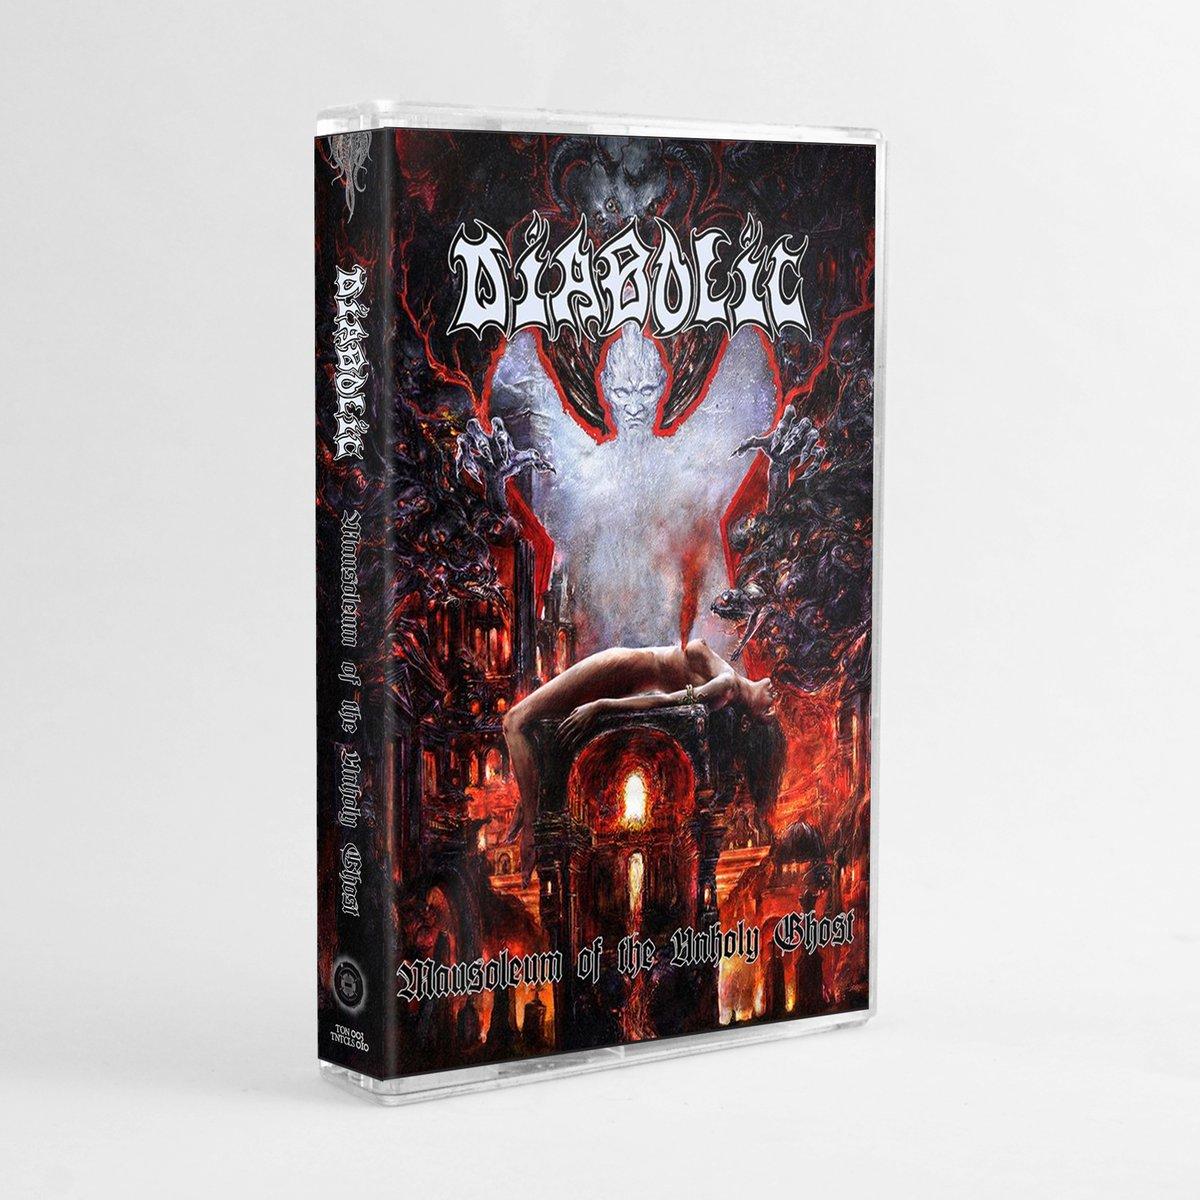 "TNTCLS 010 - DIABOLIC - ""Mausoleum of the Unholy Ghost"" - Ltd TAPE / Cassette"